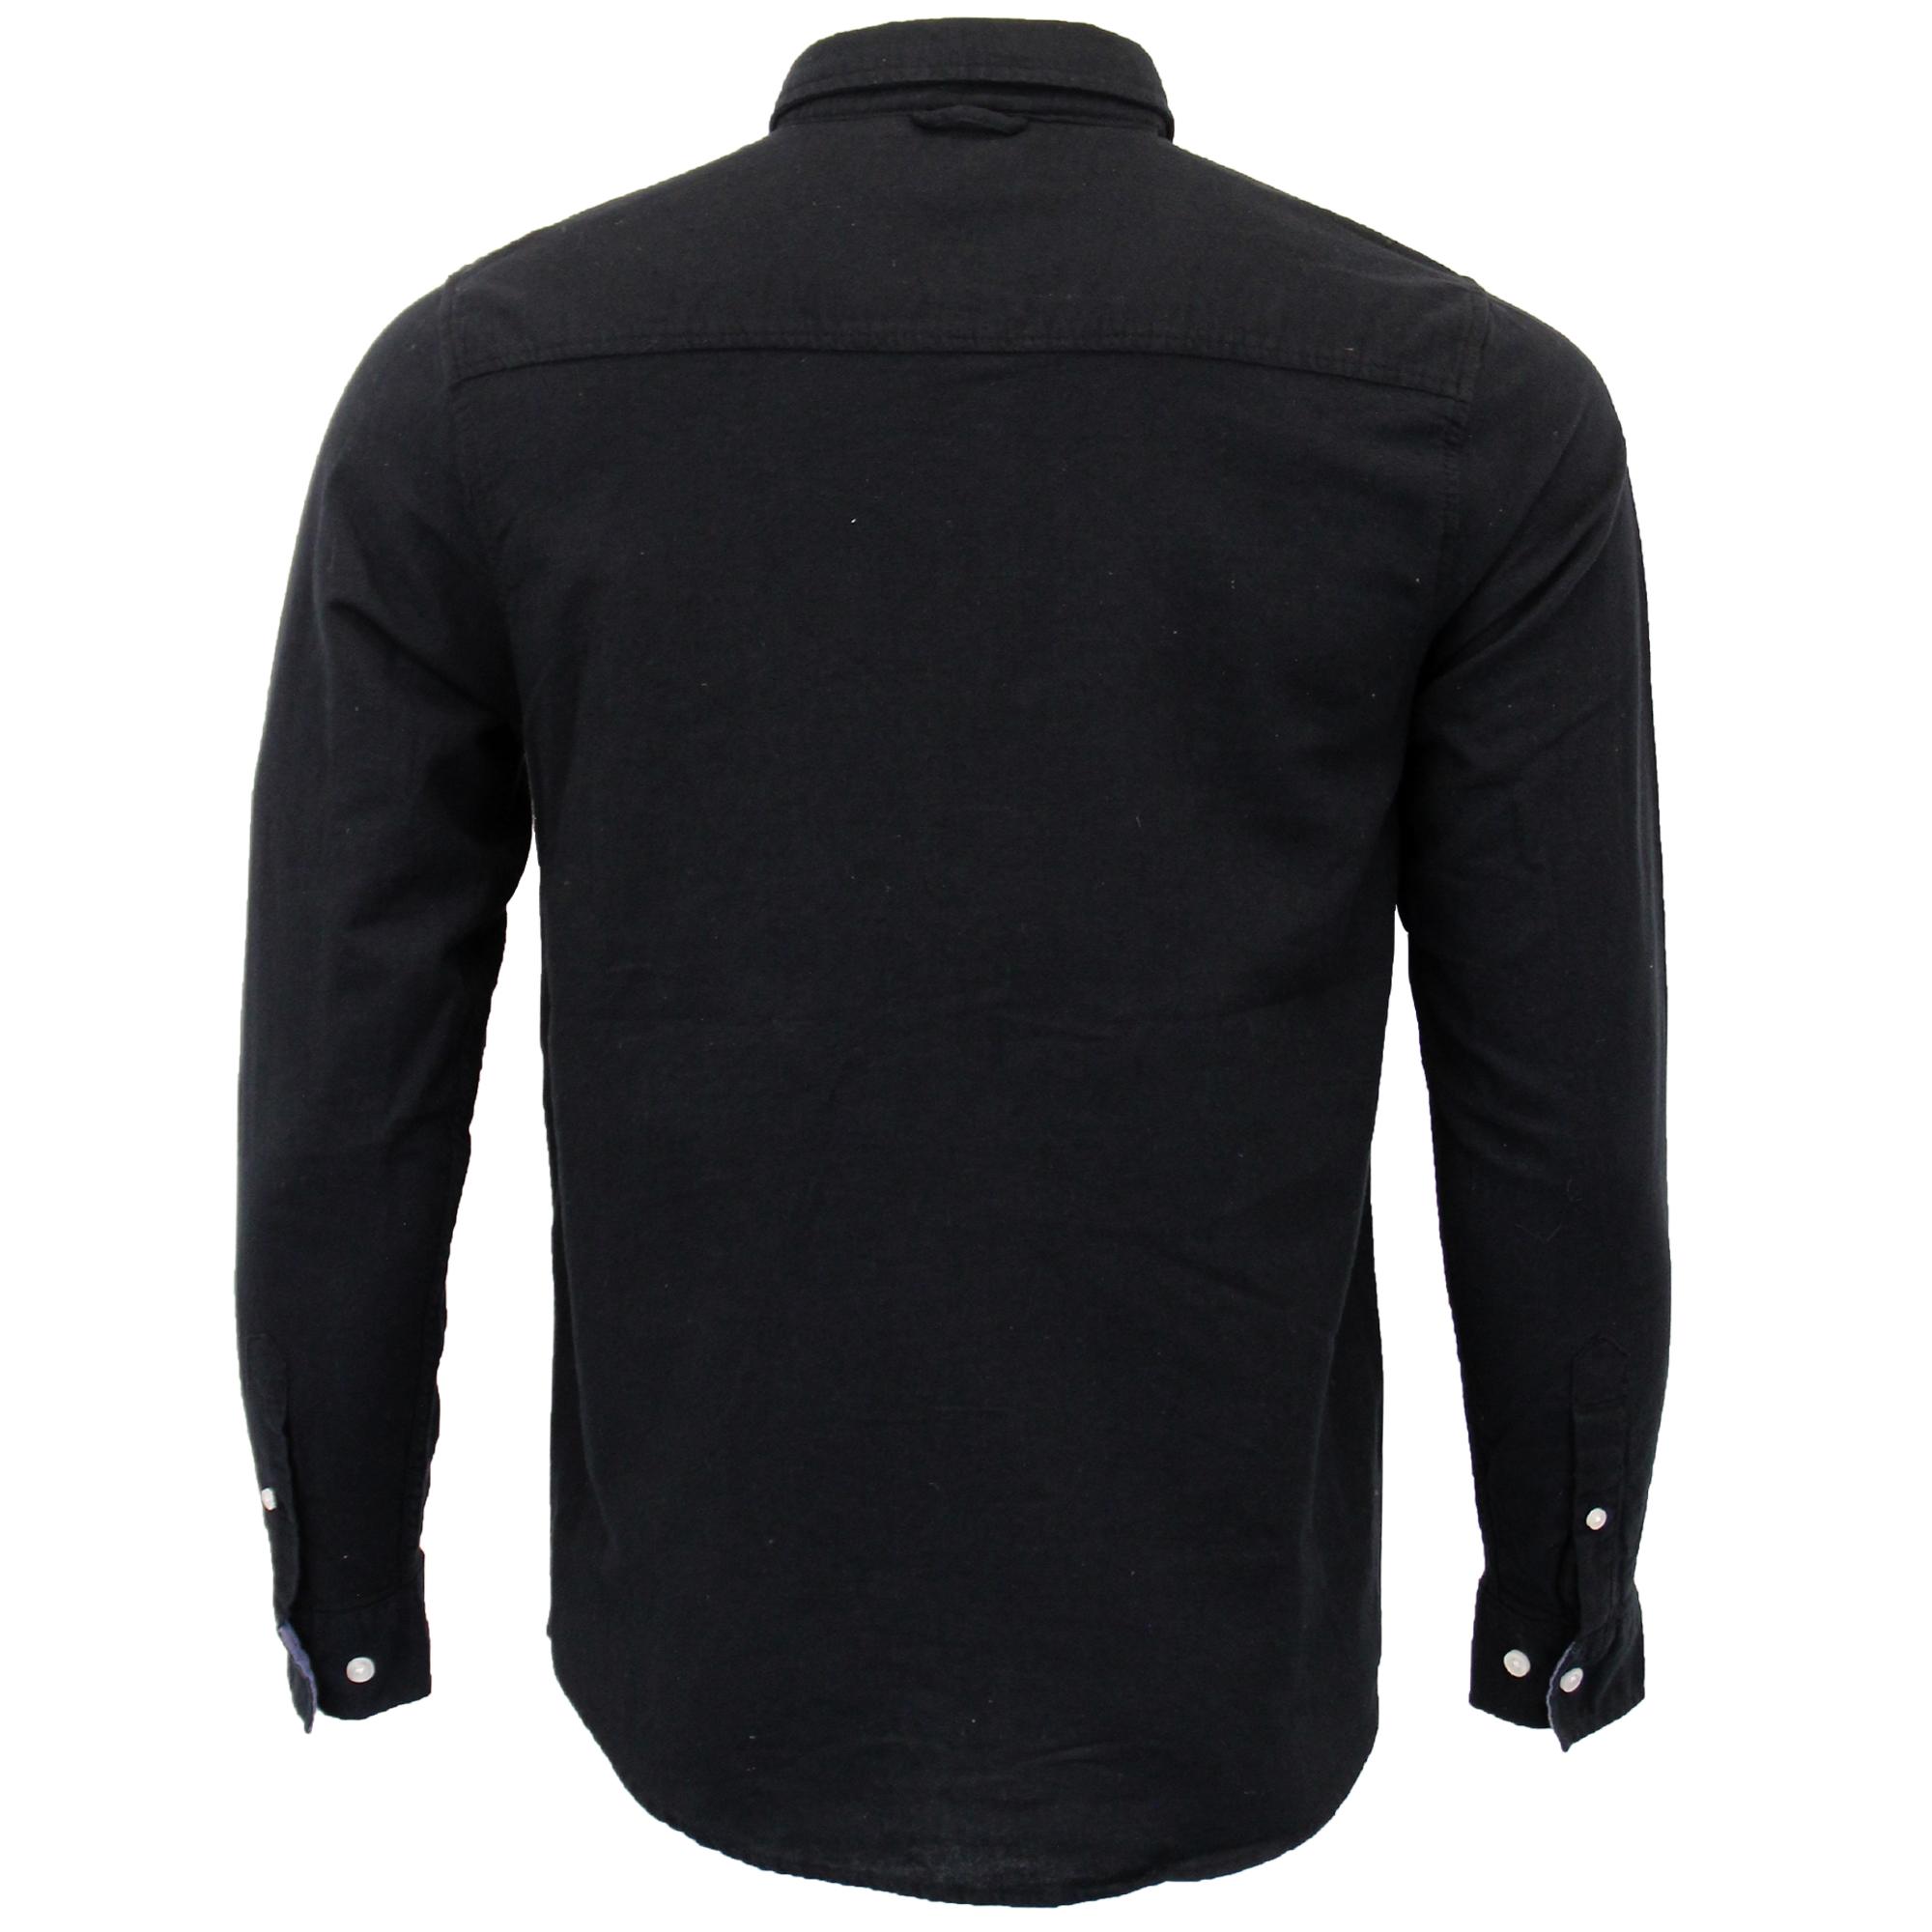 Mens-Brushed-Cotton-Shirt-Brave-Soul-Long-Sleeved-Flannel-HOLMES-Casual-Designer thumbnail 3